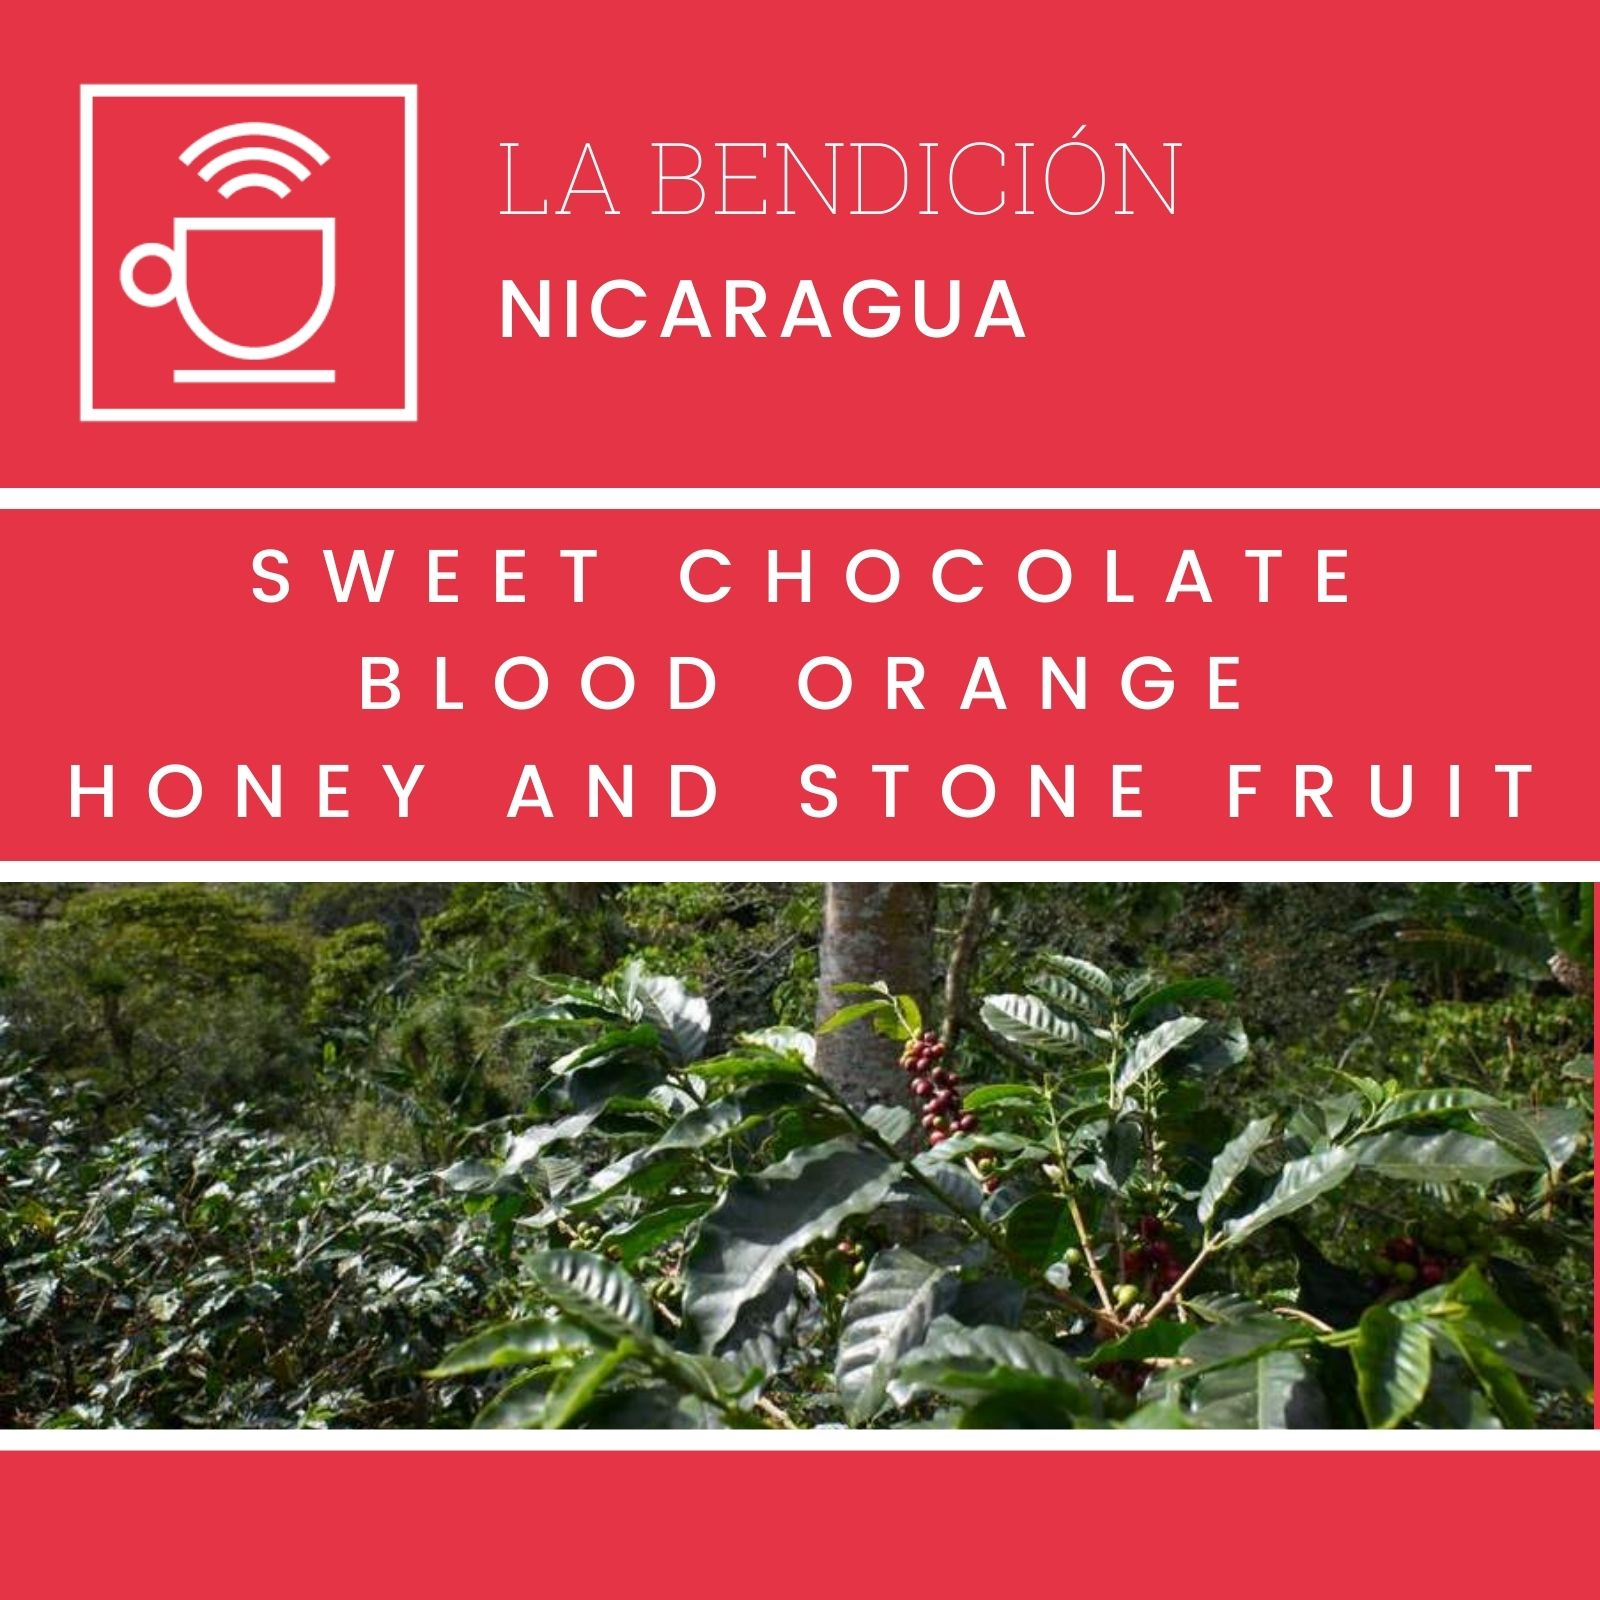 La Bendicion - Nicaragua, Clever Coffee | 250g